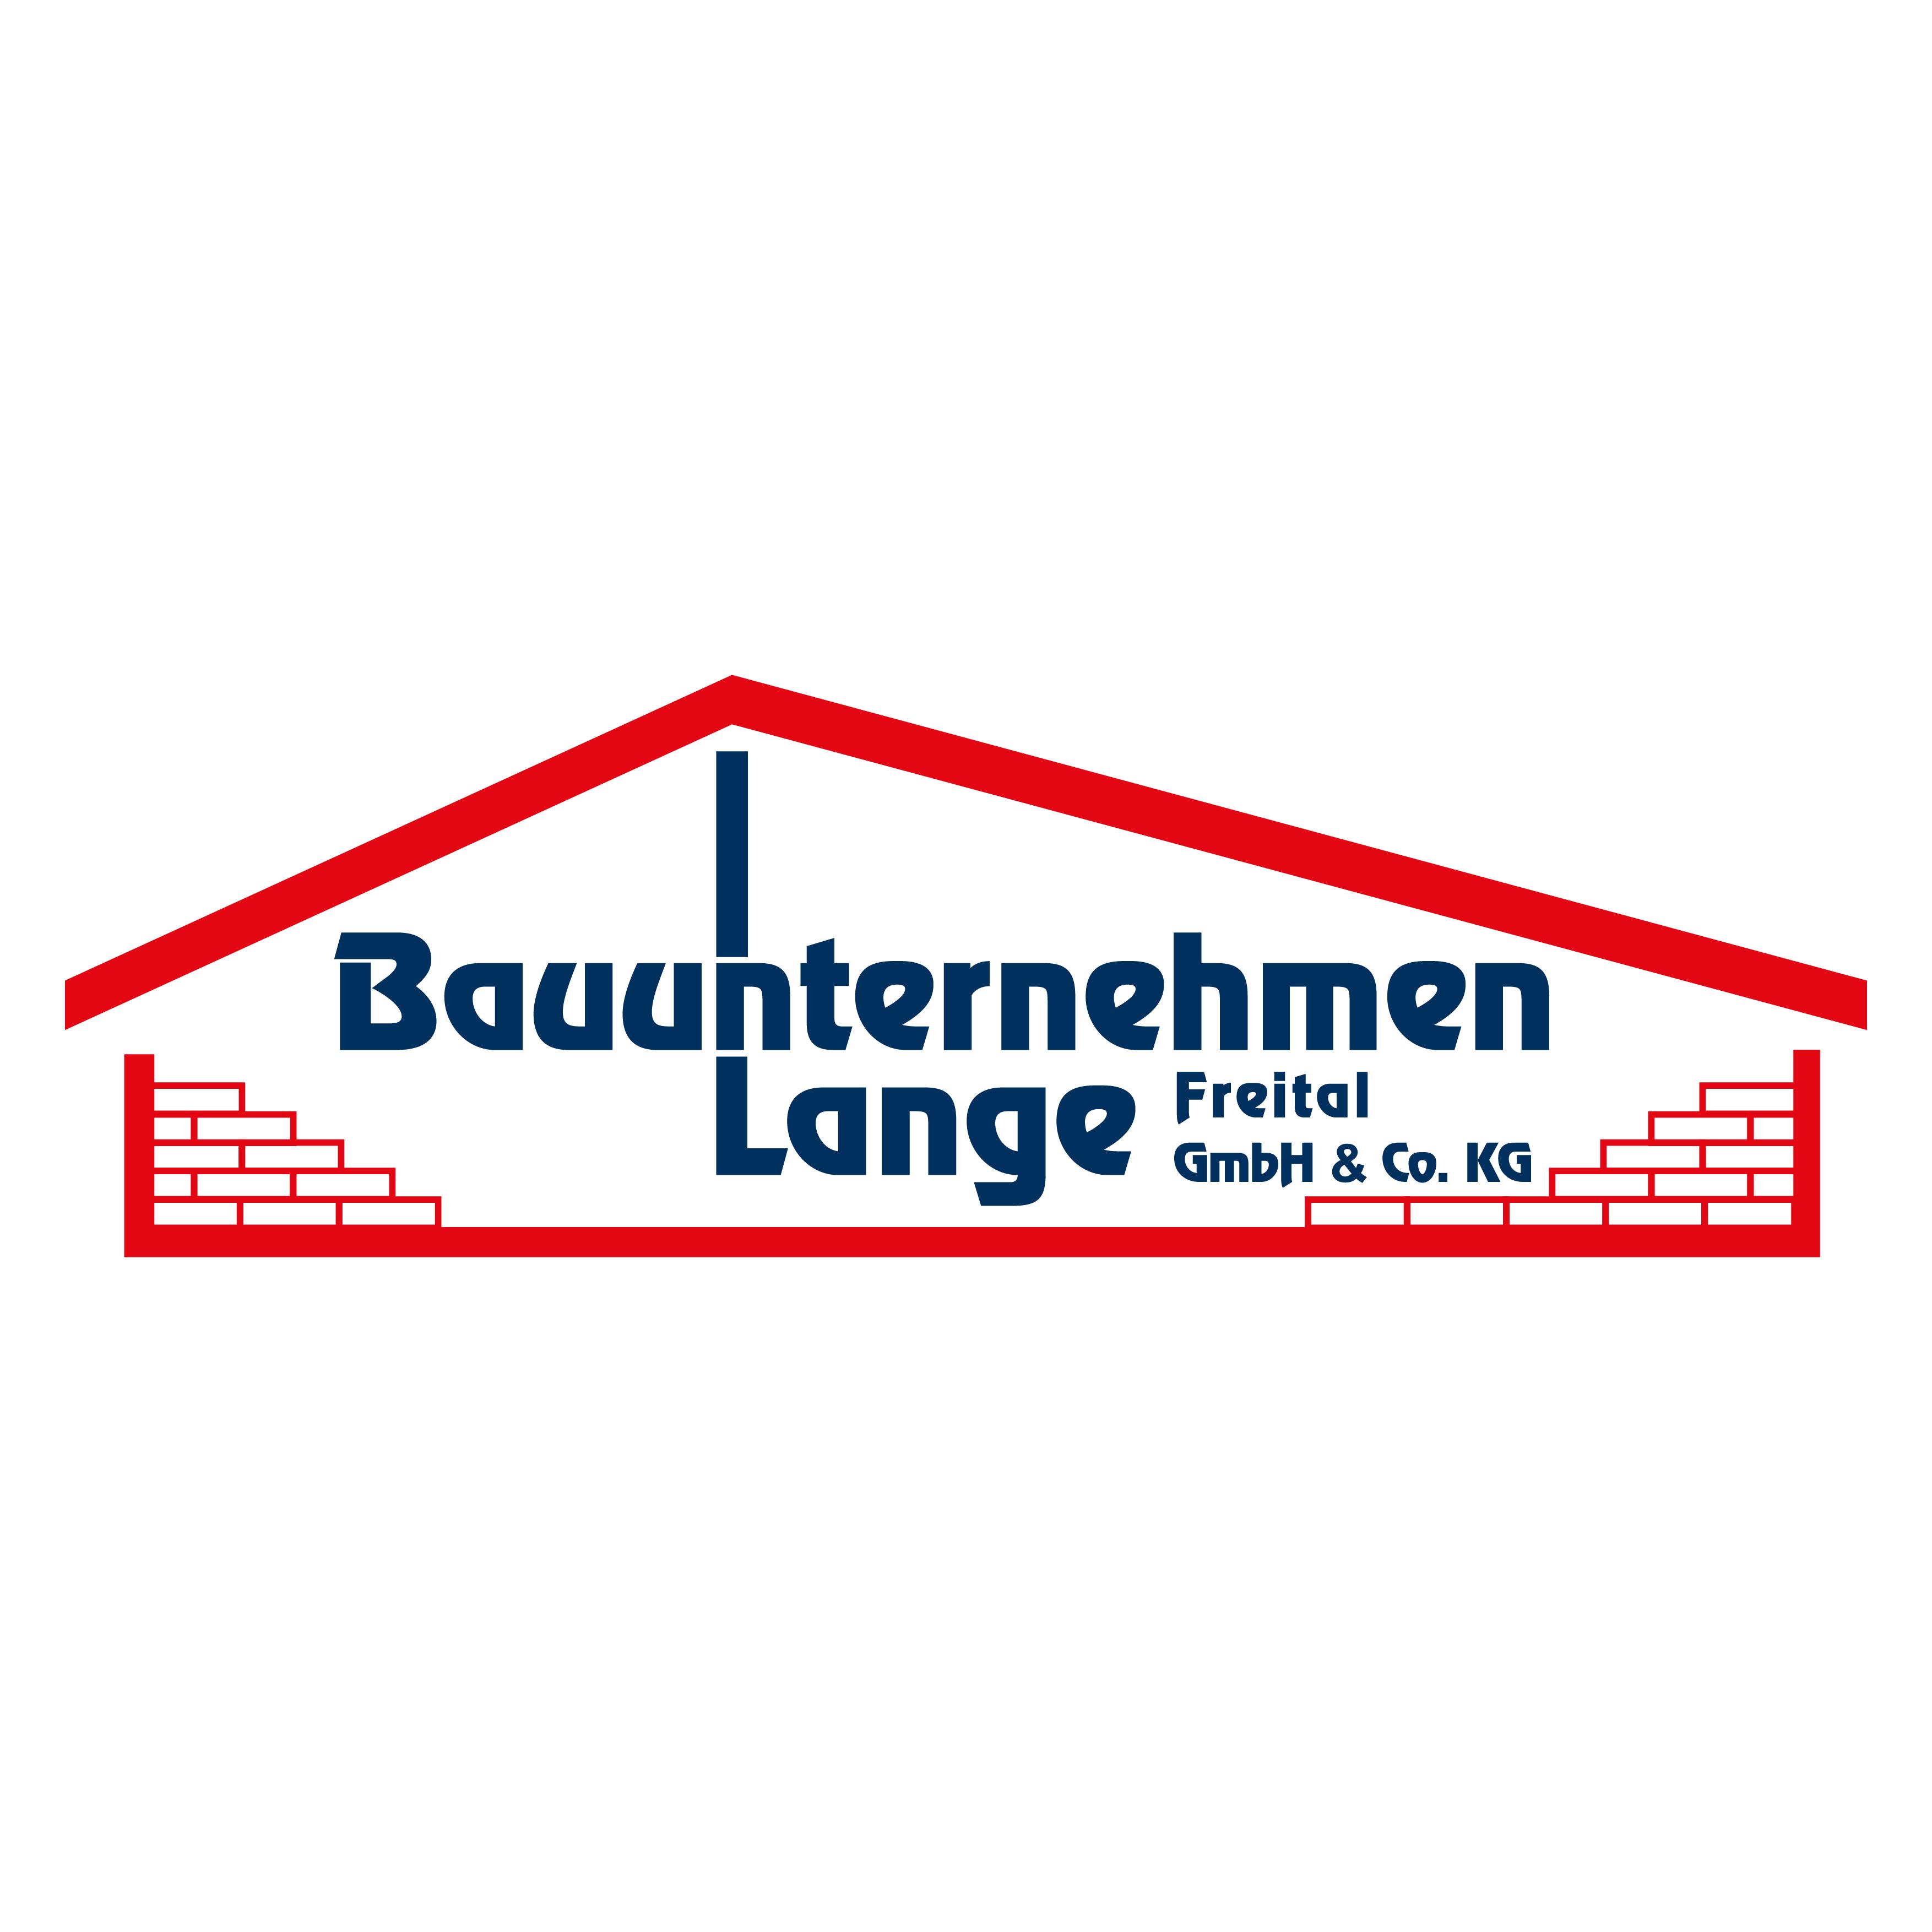 Bild zu Bauunternehmen Lange in Freital